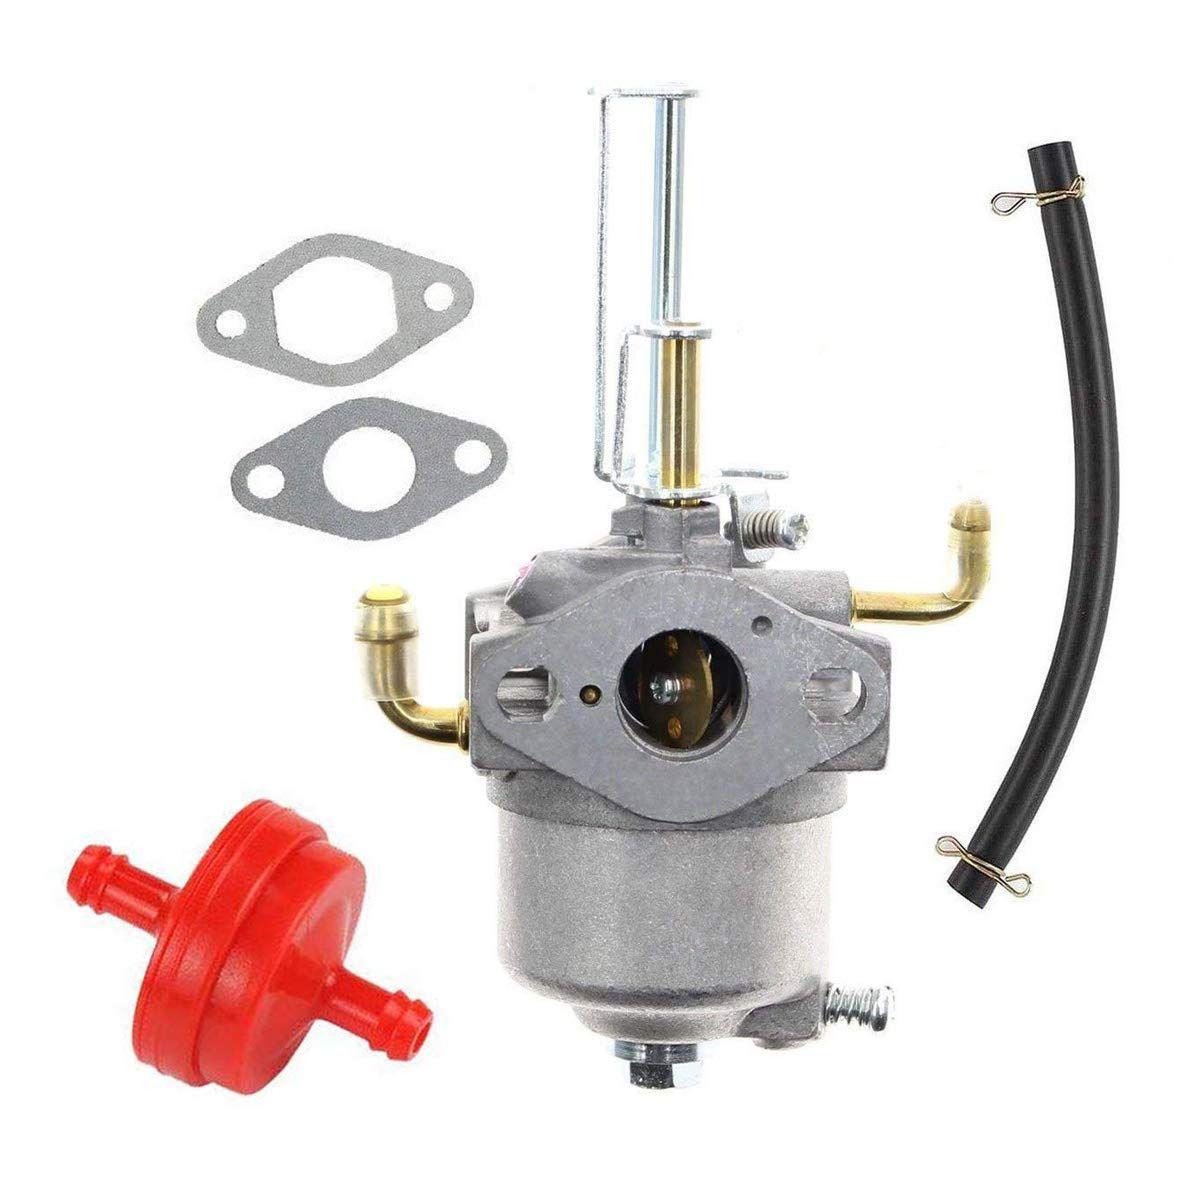 medium resolution of hqparts carburetor carb and fuel filter for carburetor for toro 38587 38272 38282 38452 snow blower